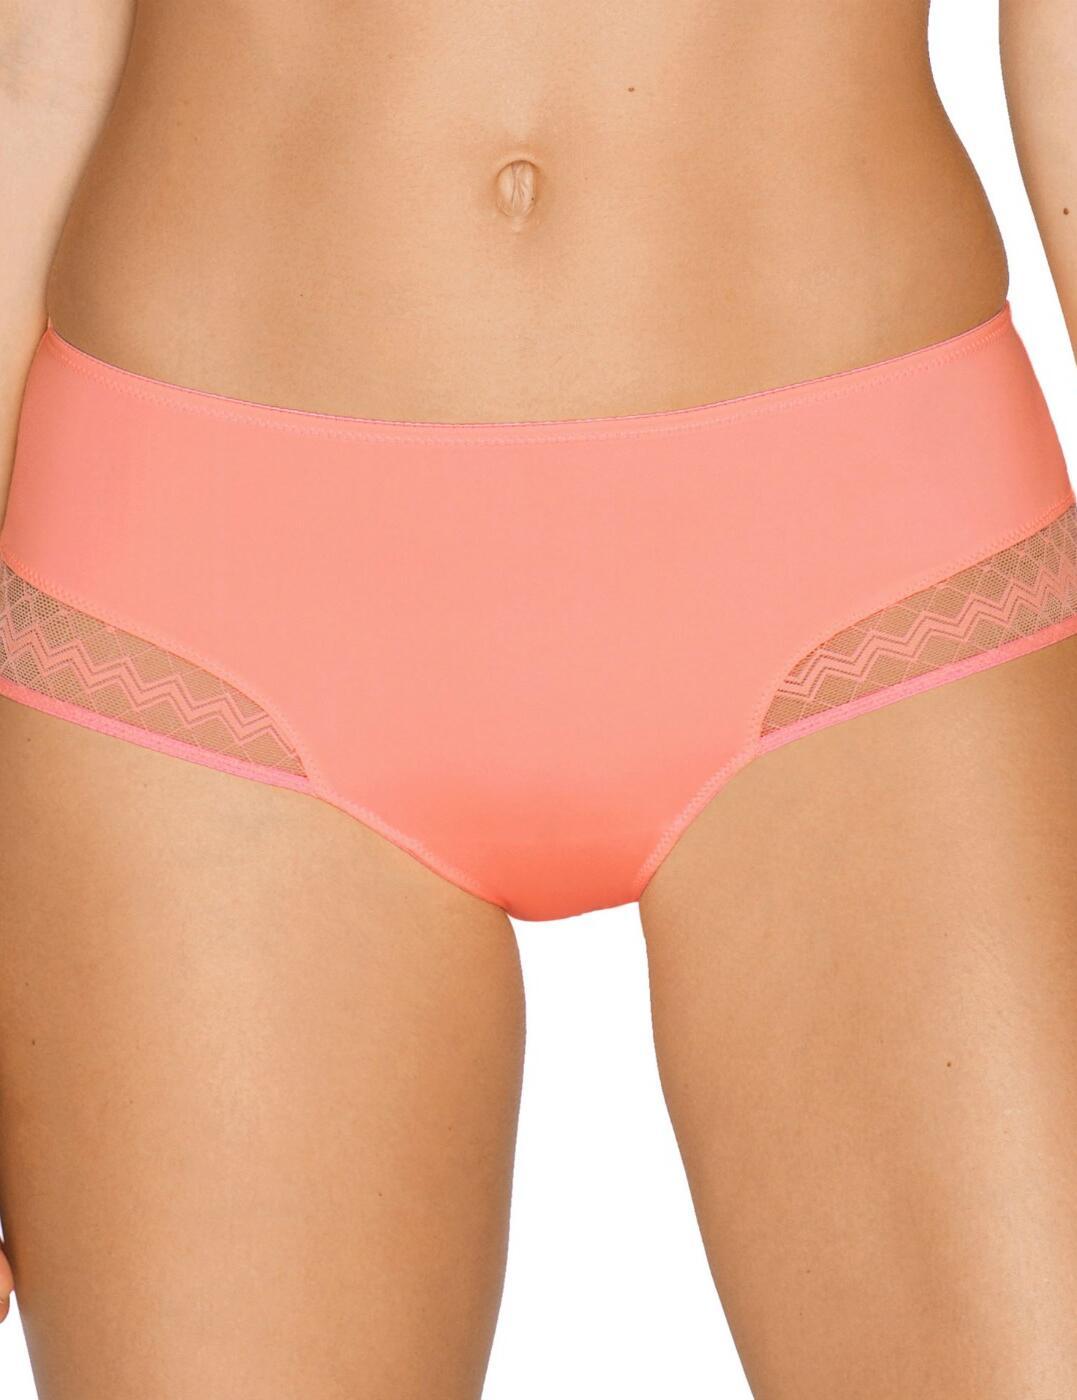 0541642 Prima Donna Twist Zig Zag Hotpants - 0541642 Sweet Peach